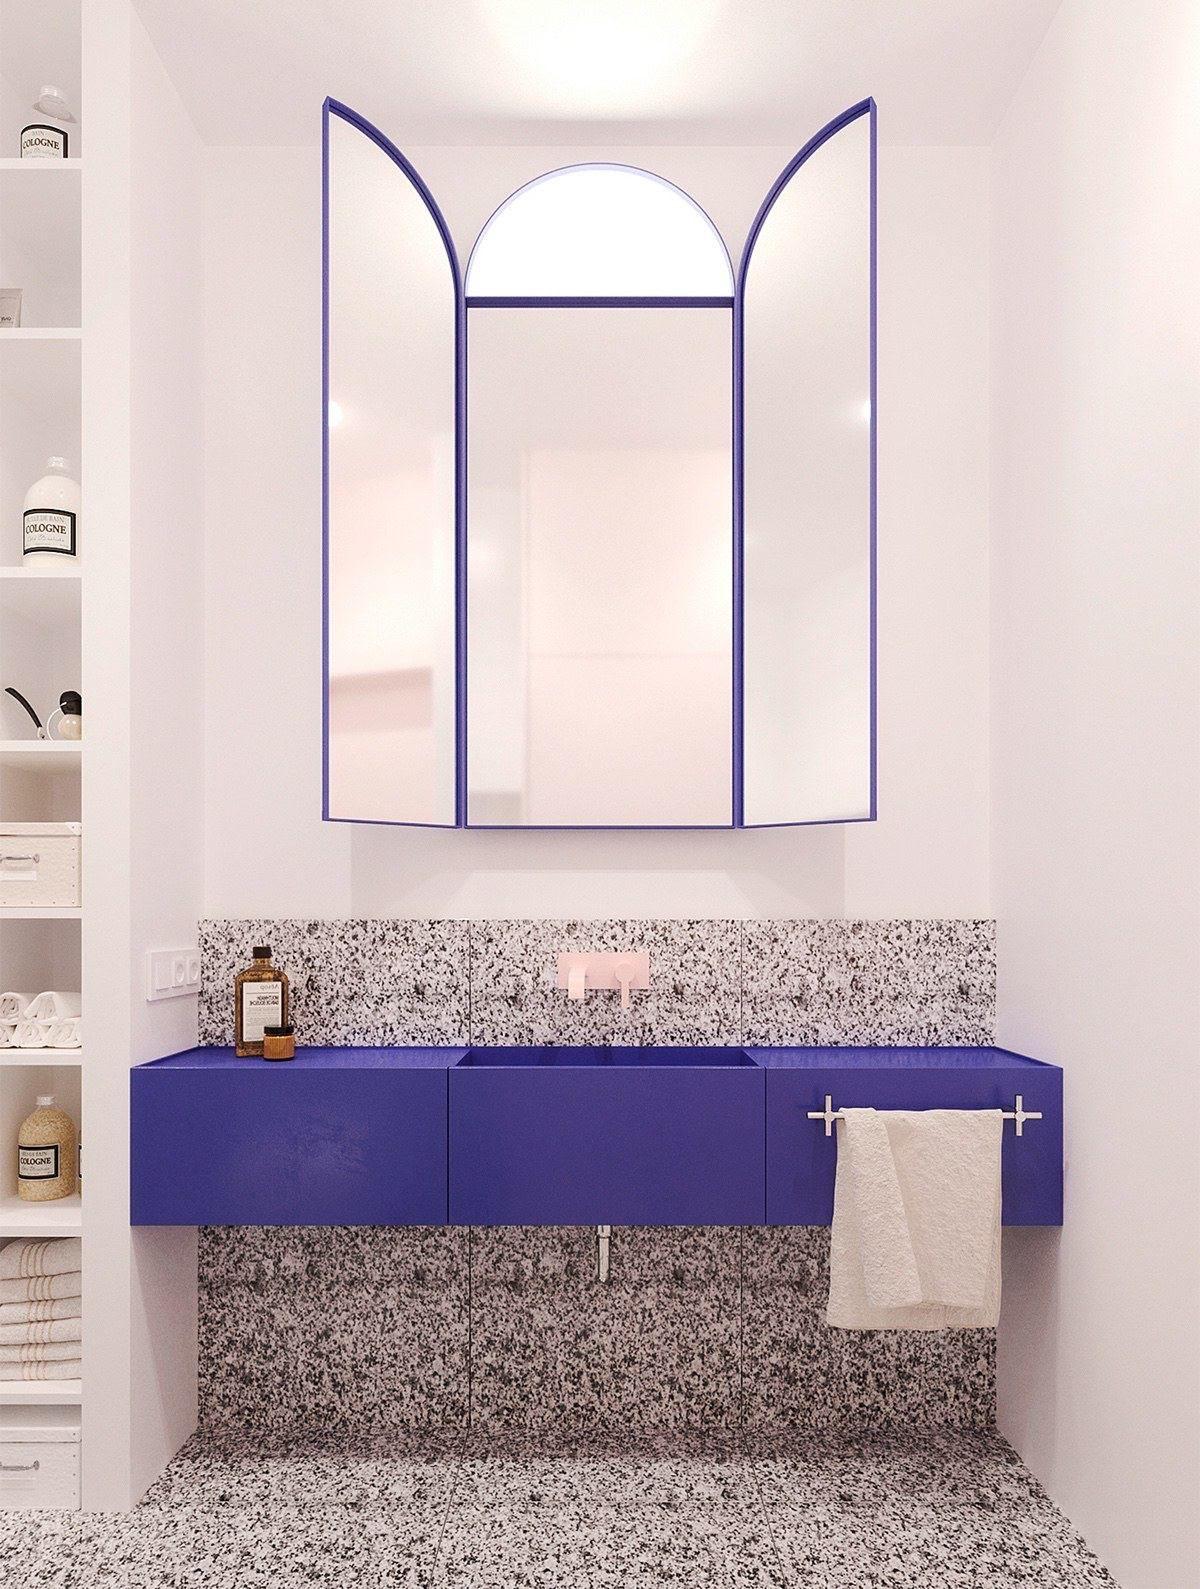 Iya Turabelidze Of Interior Design Company Concretica Describes The Stylesu2026